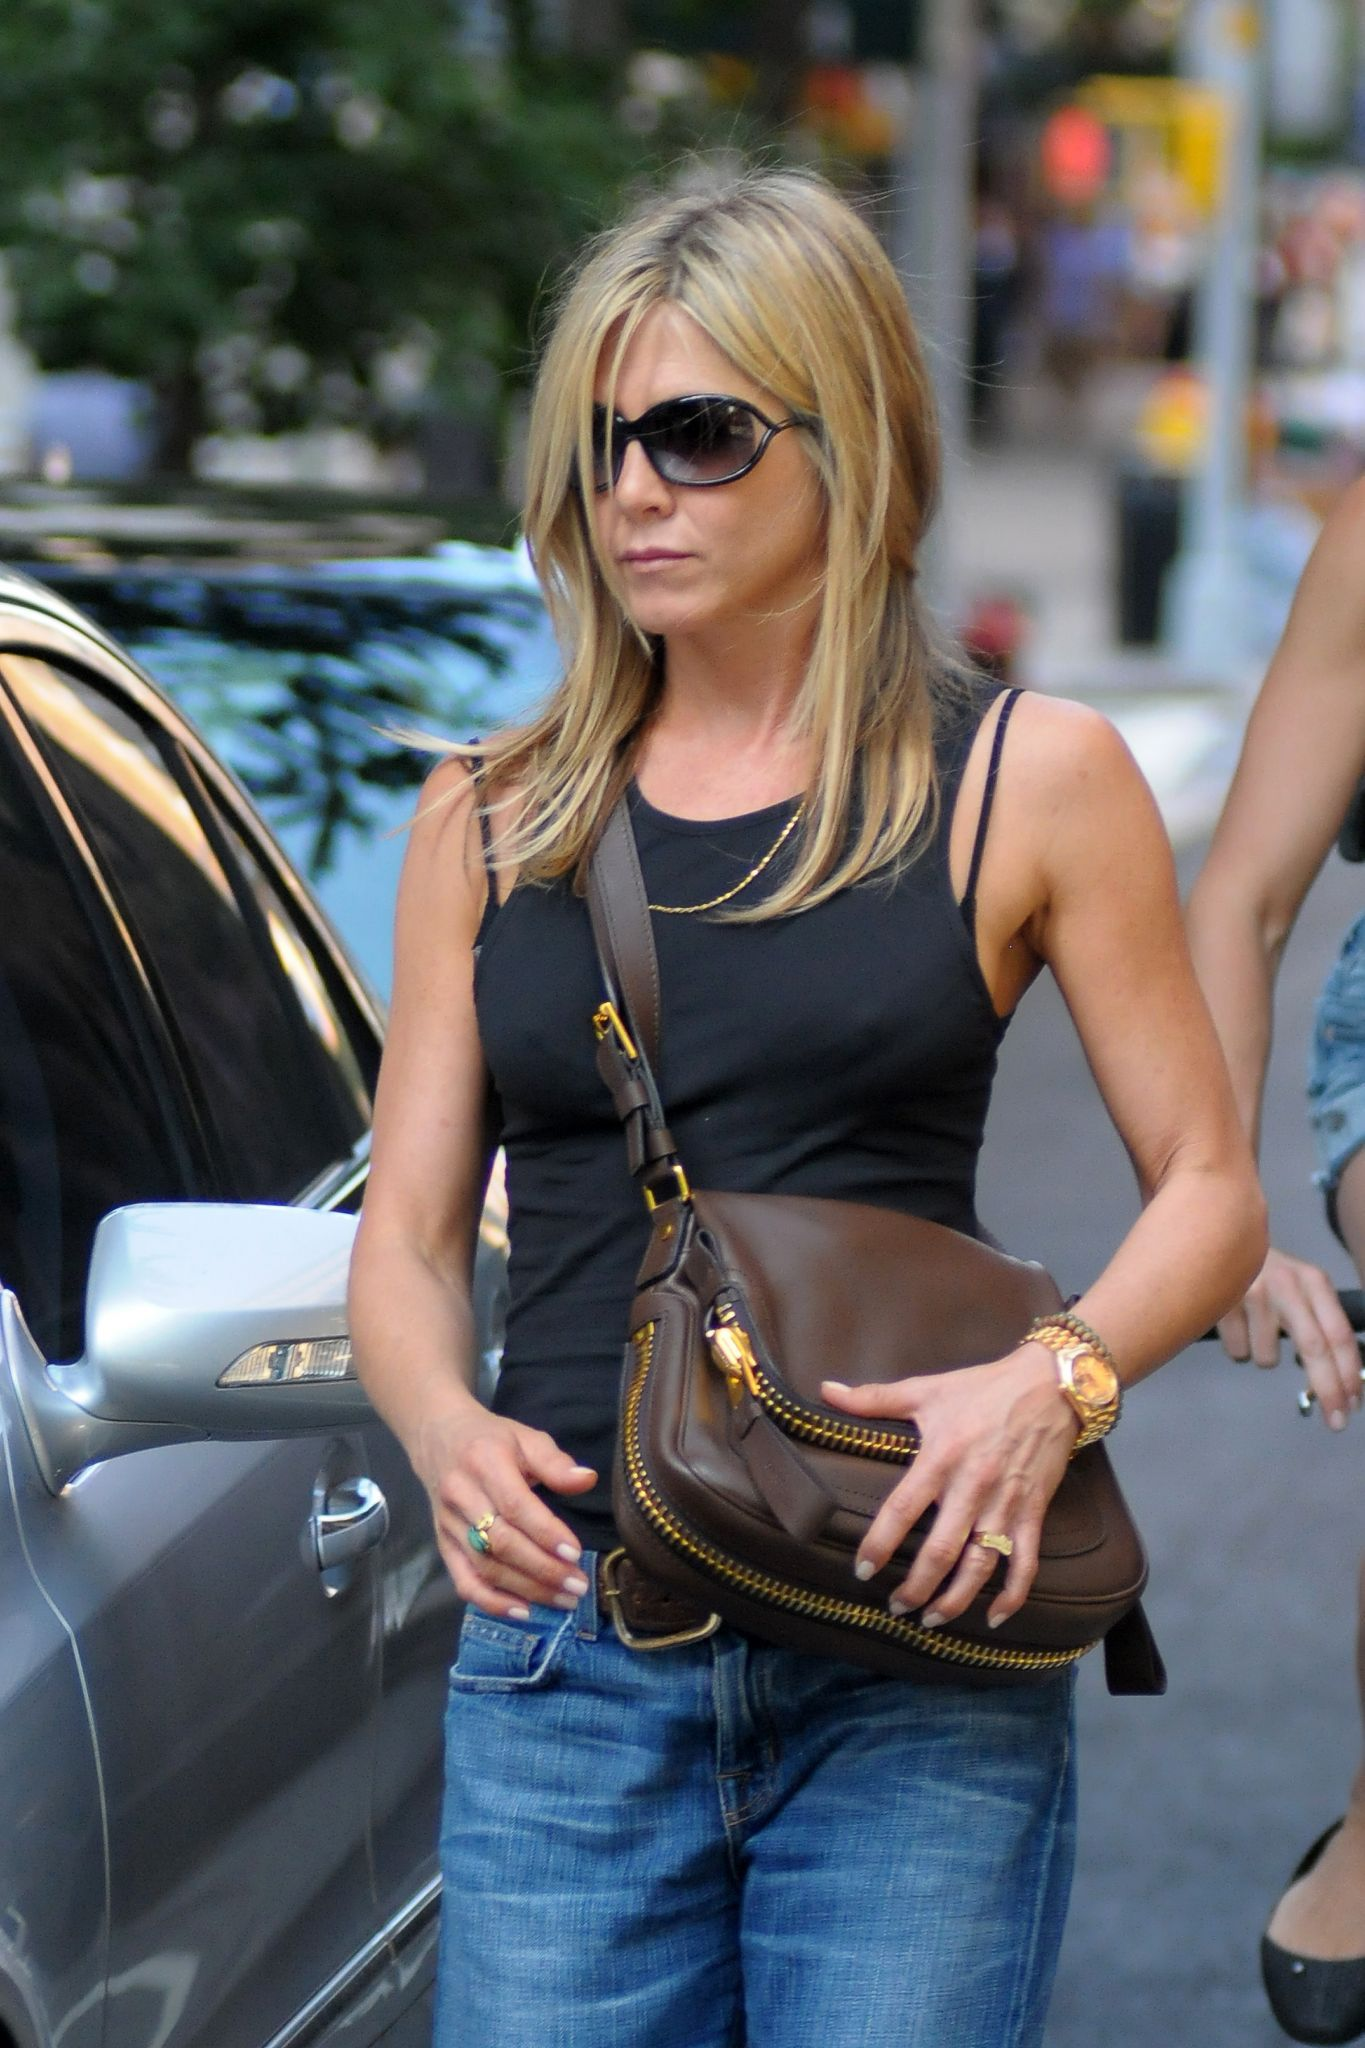 acdc317620844 ... tom ford glasses. Jennifer Aniston